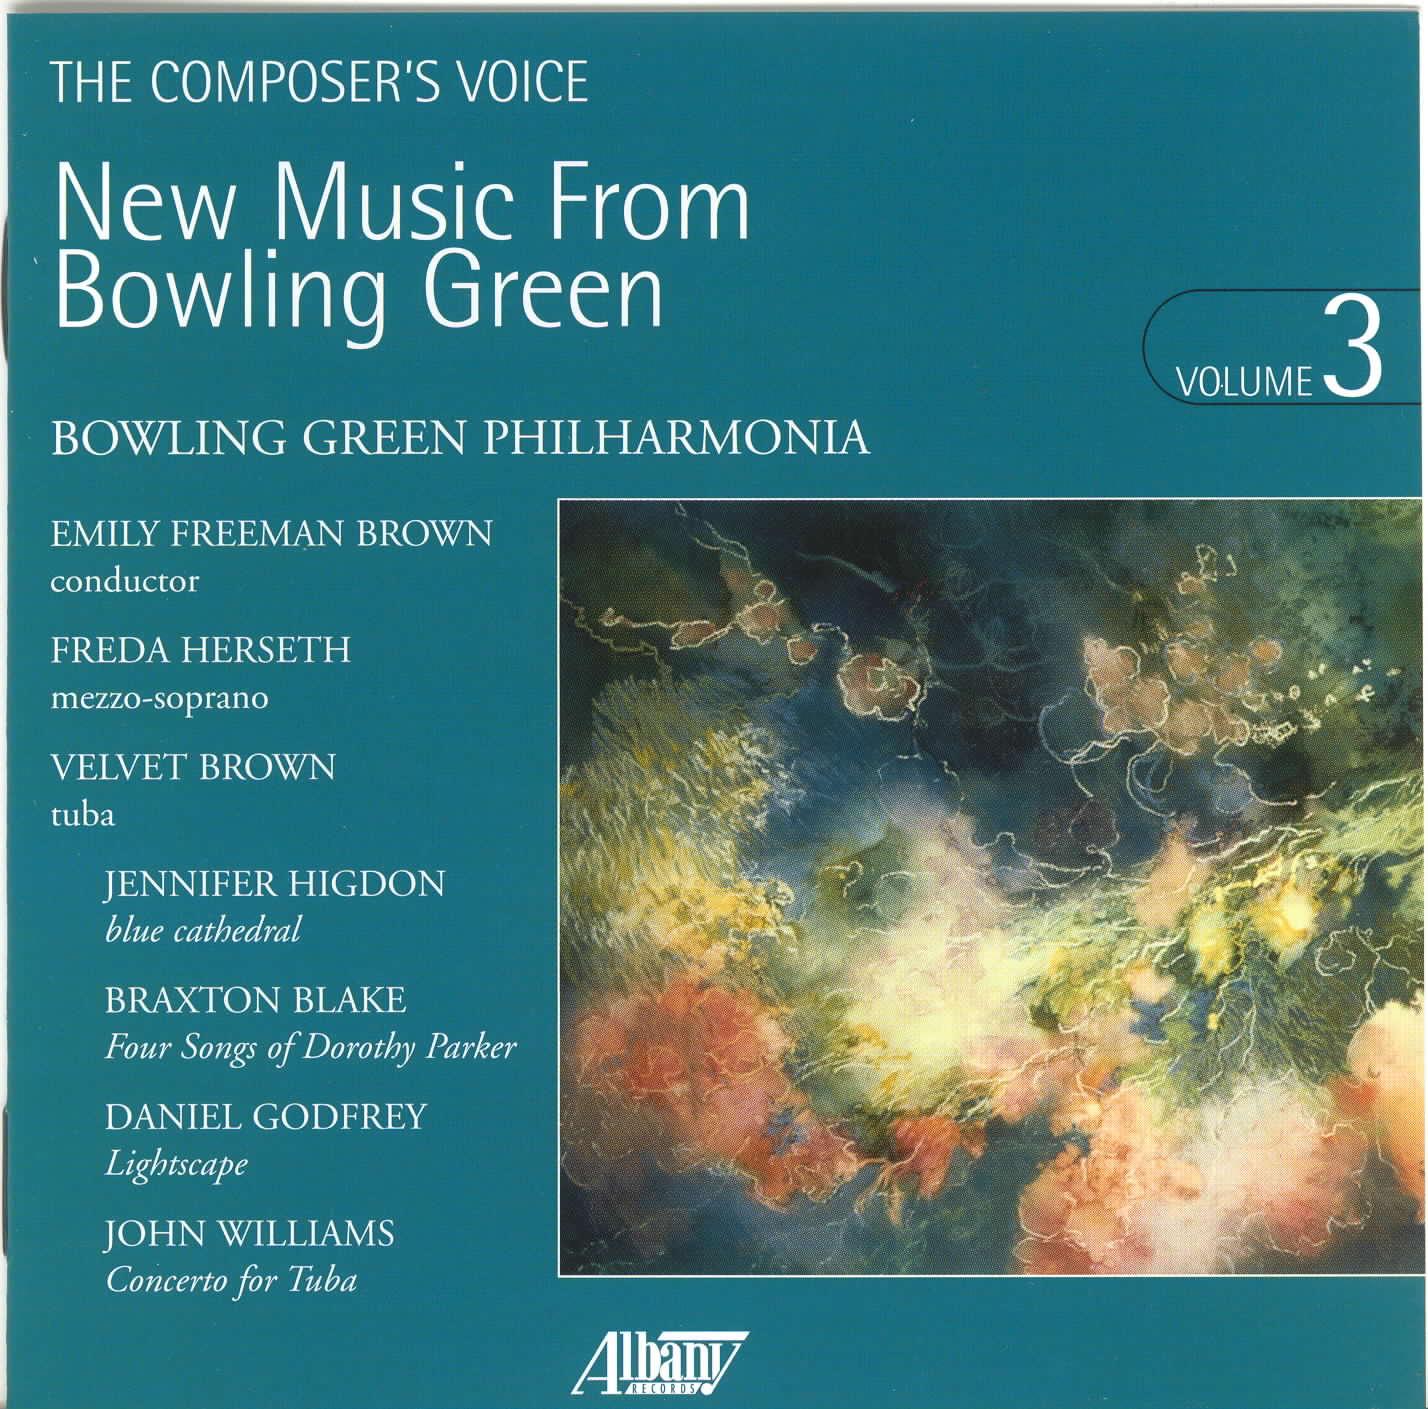 New Music From Bowling Green, Vol. 3 -  Higdon, J. - Blake, B. - Godfrey, D. - Williams, J.